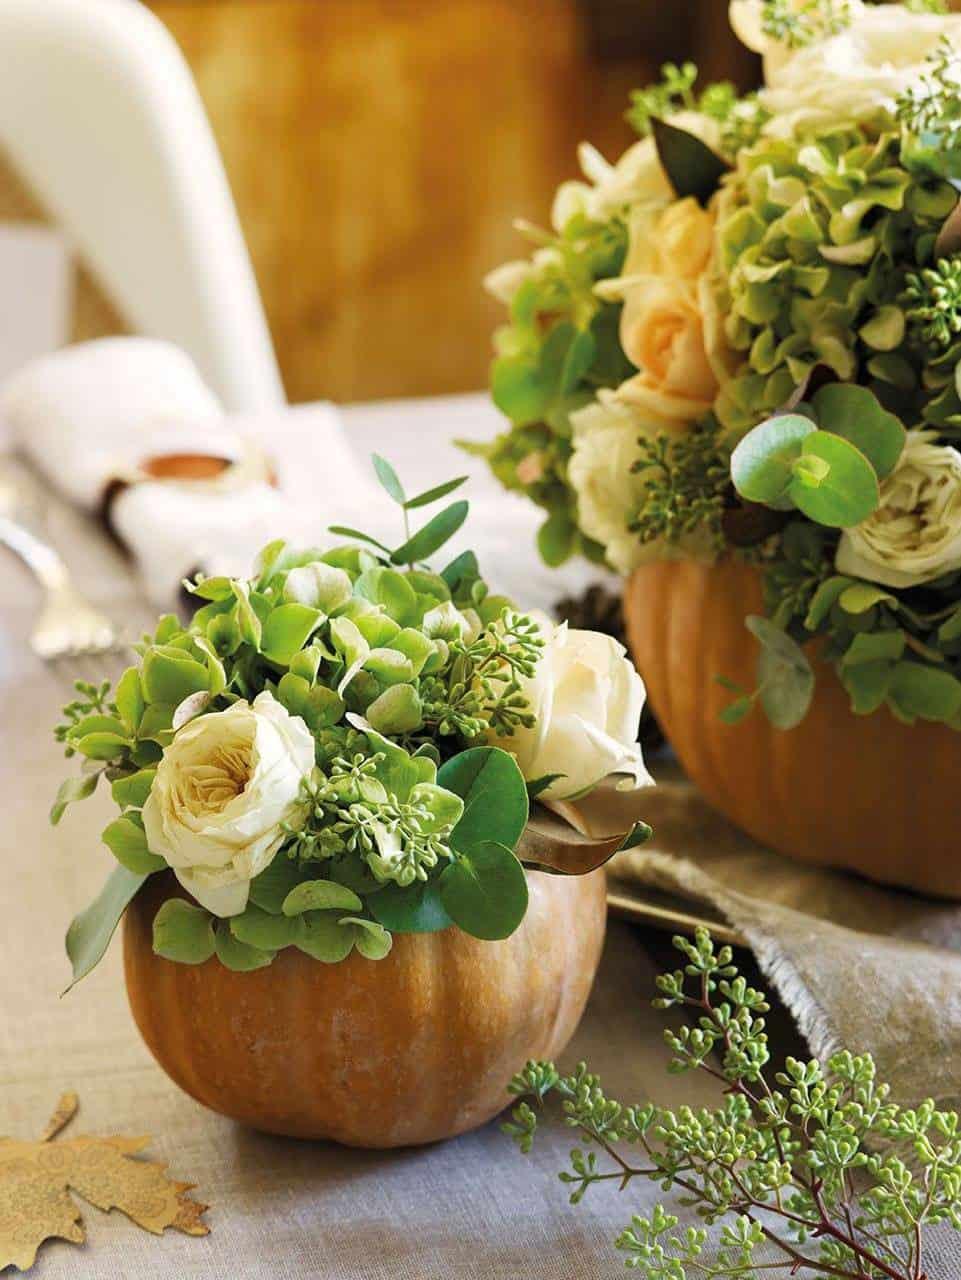 pumpkin-vase-with-flowers